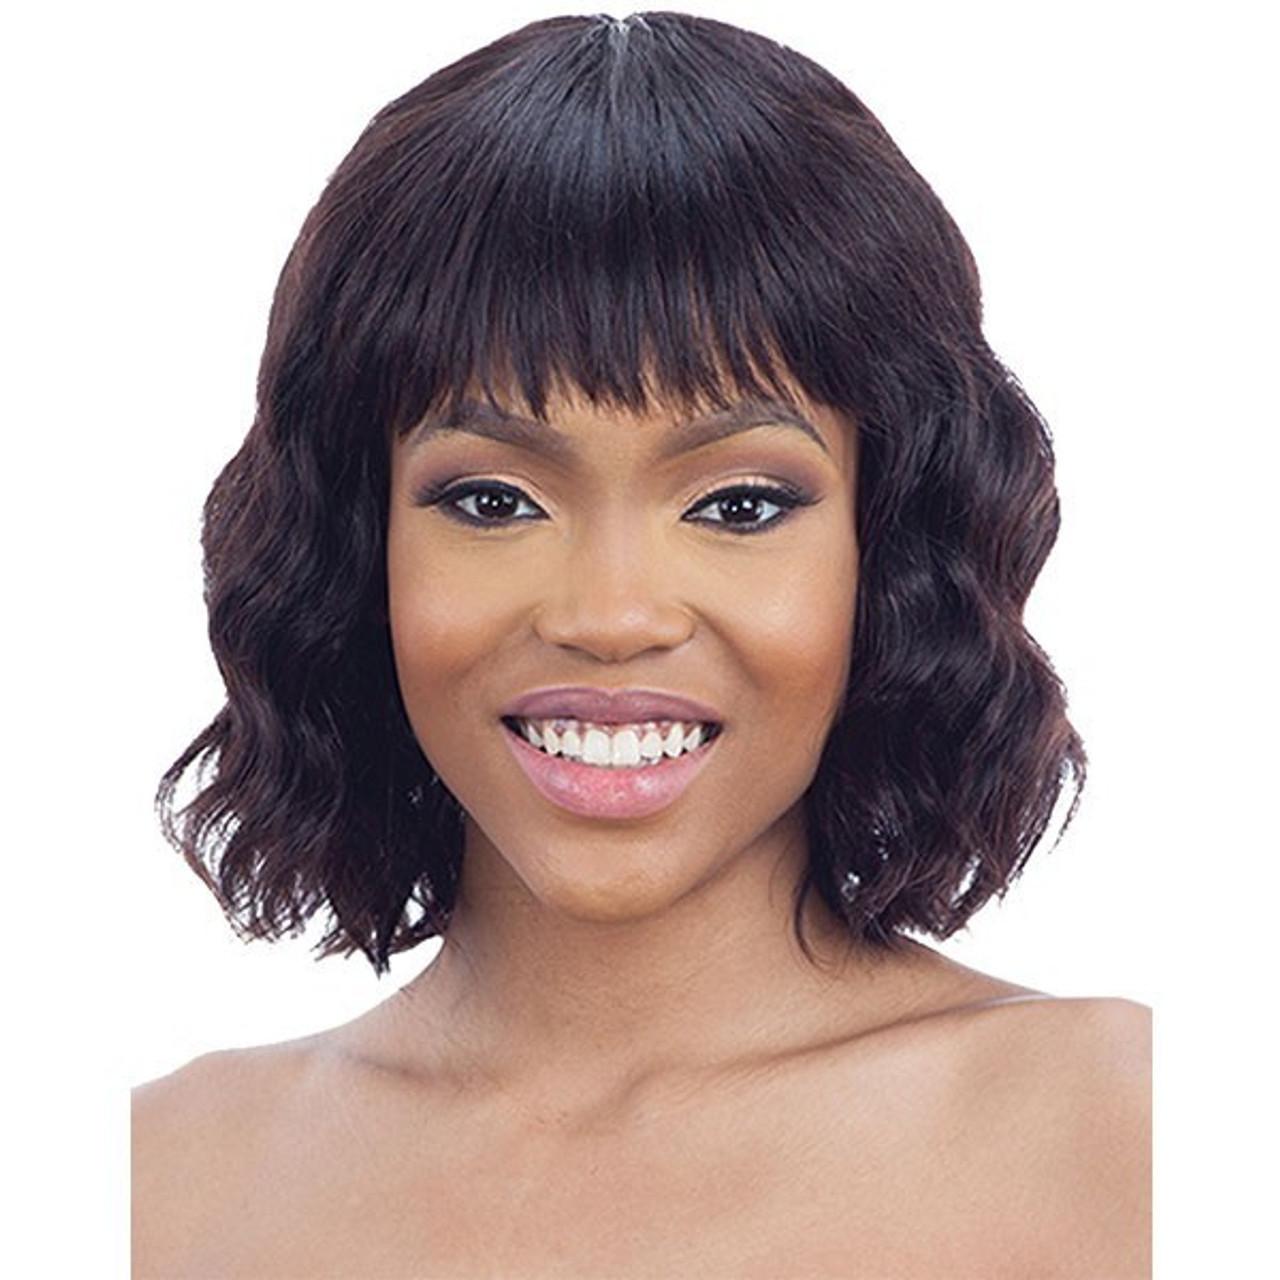 MAYDE Beauty 100% Human Hair Wig SIRI